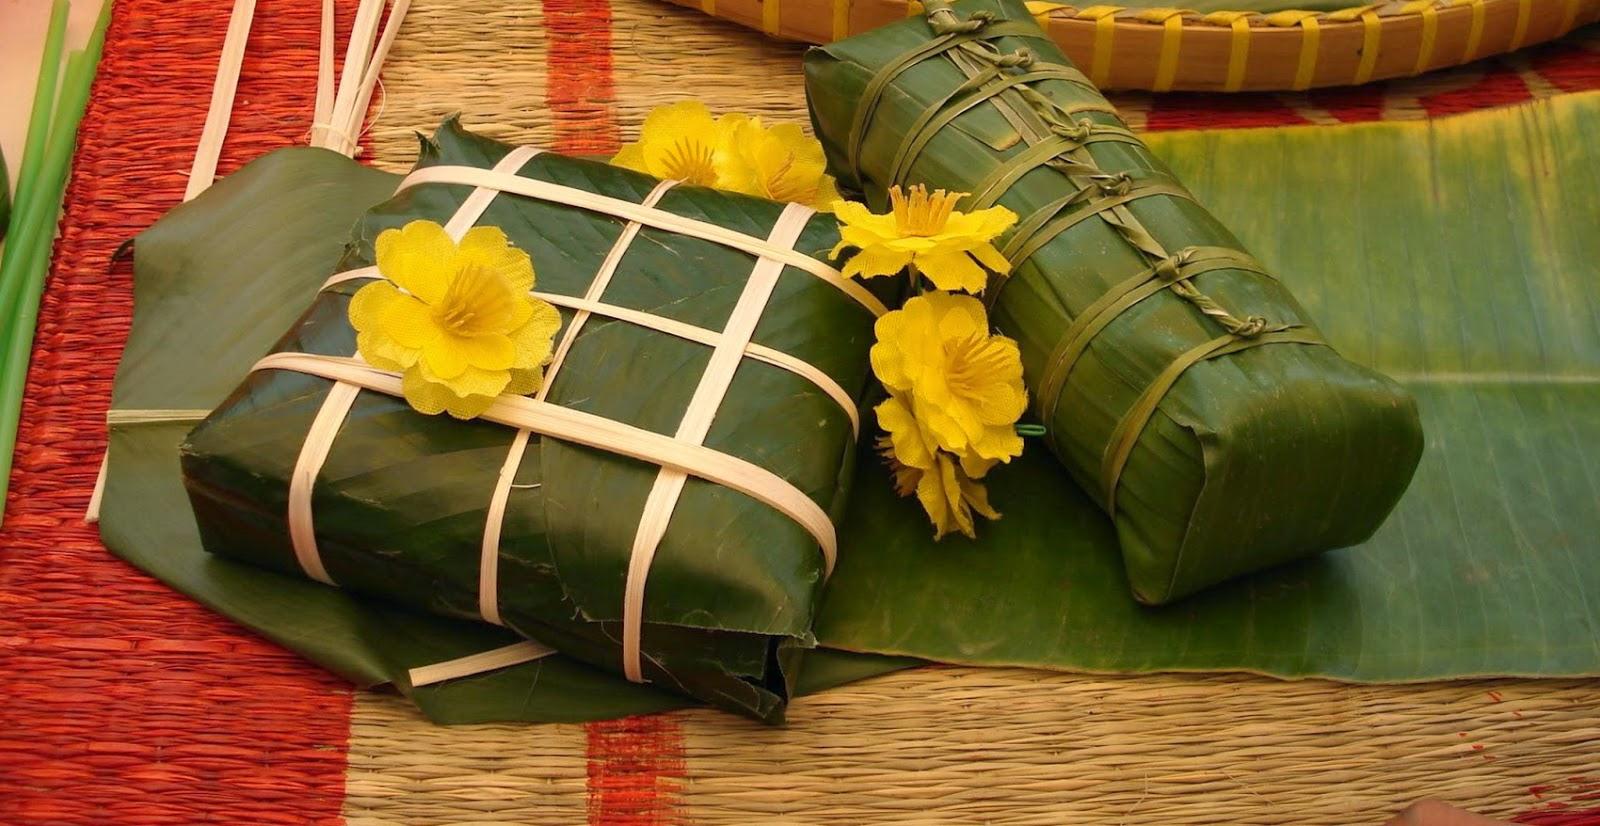 10 Kue Khas Saat Hari Raya di Berbagai Negara di Dunia